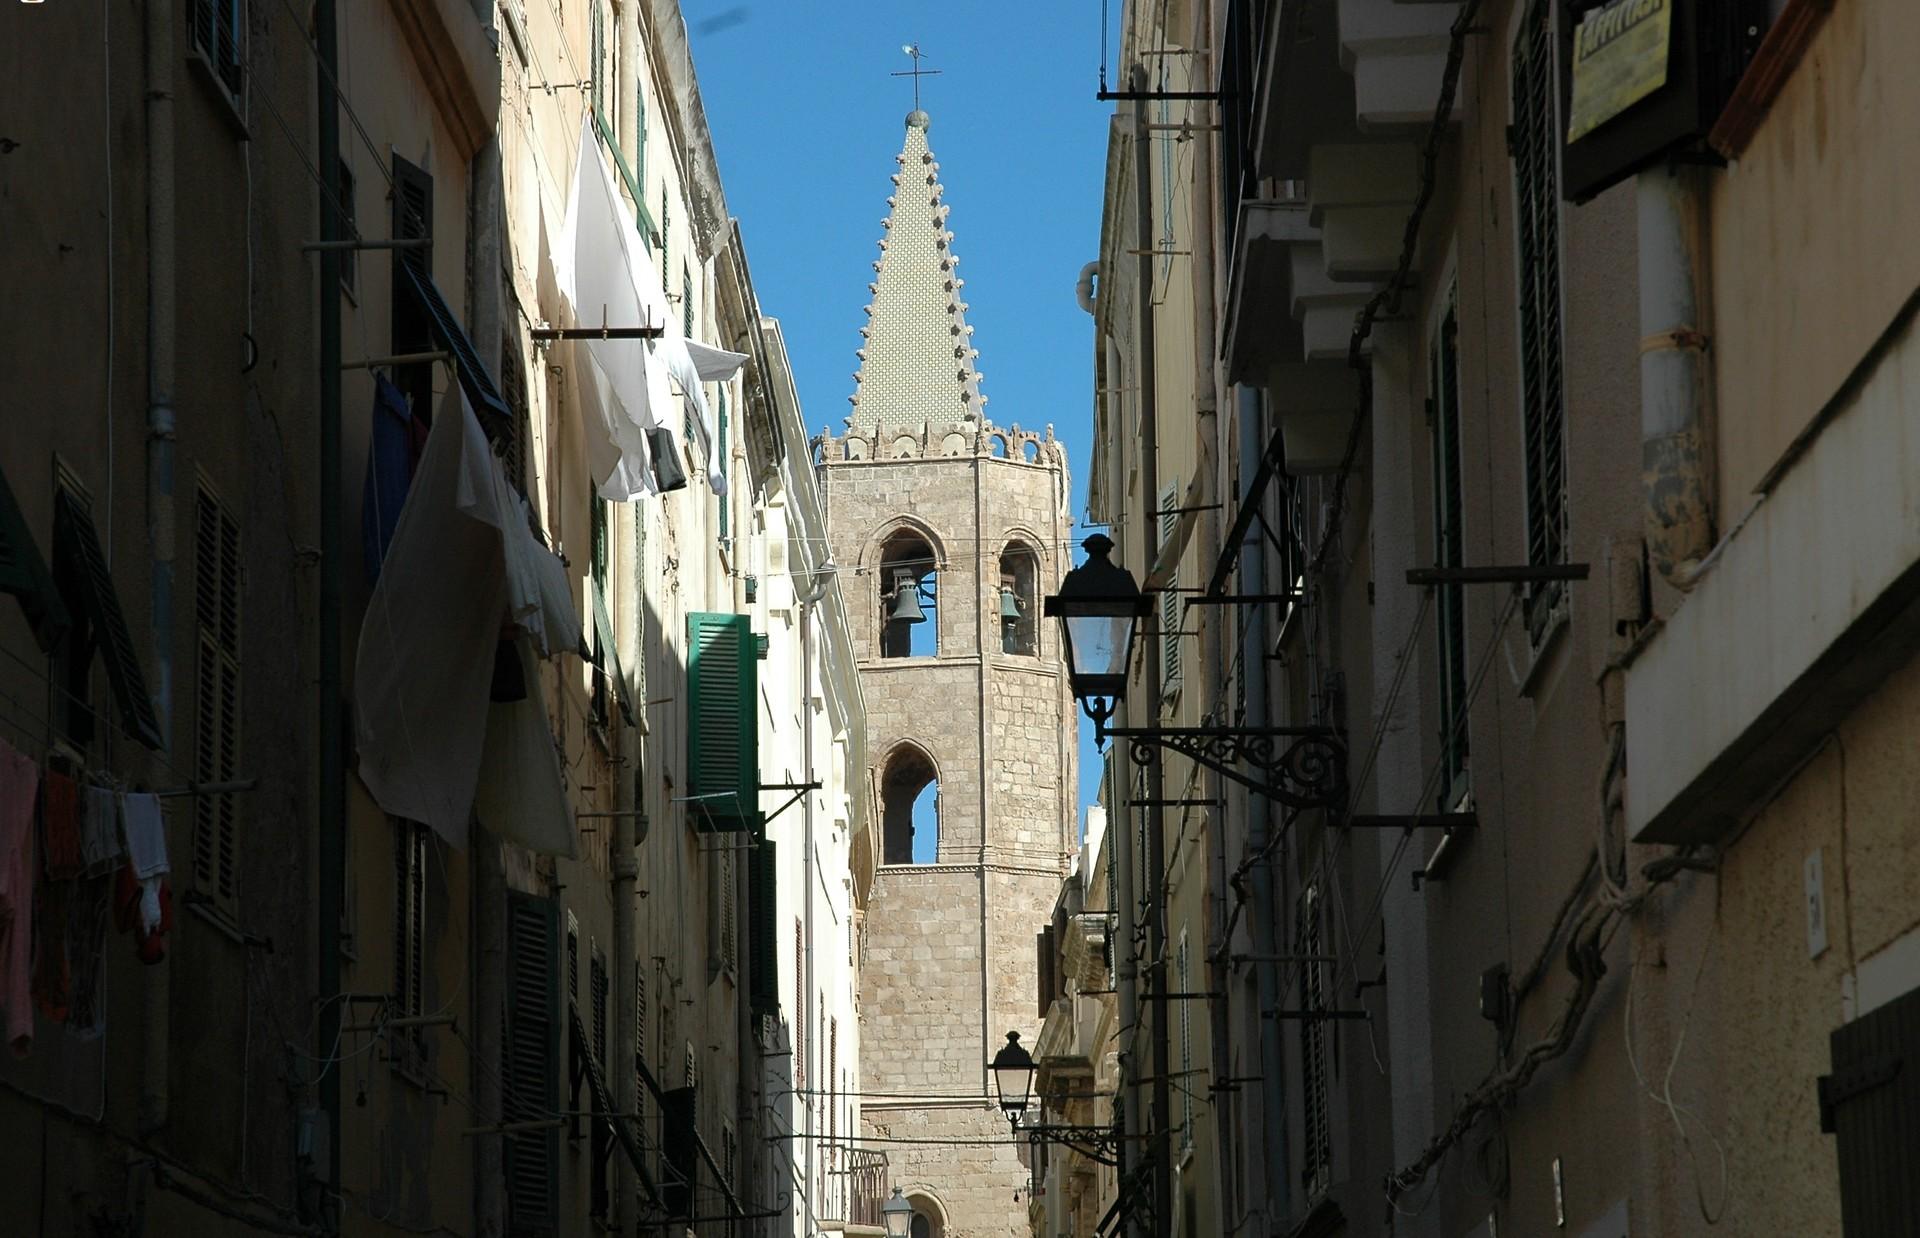 Alghero Duomo di Santa Maria Monumenti aperti 2016